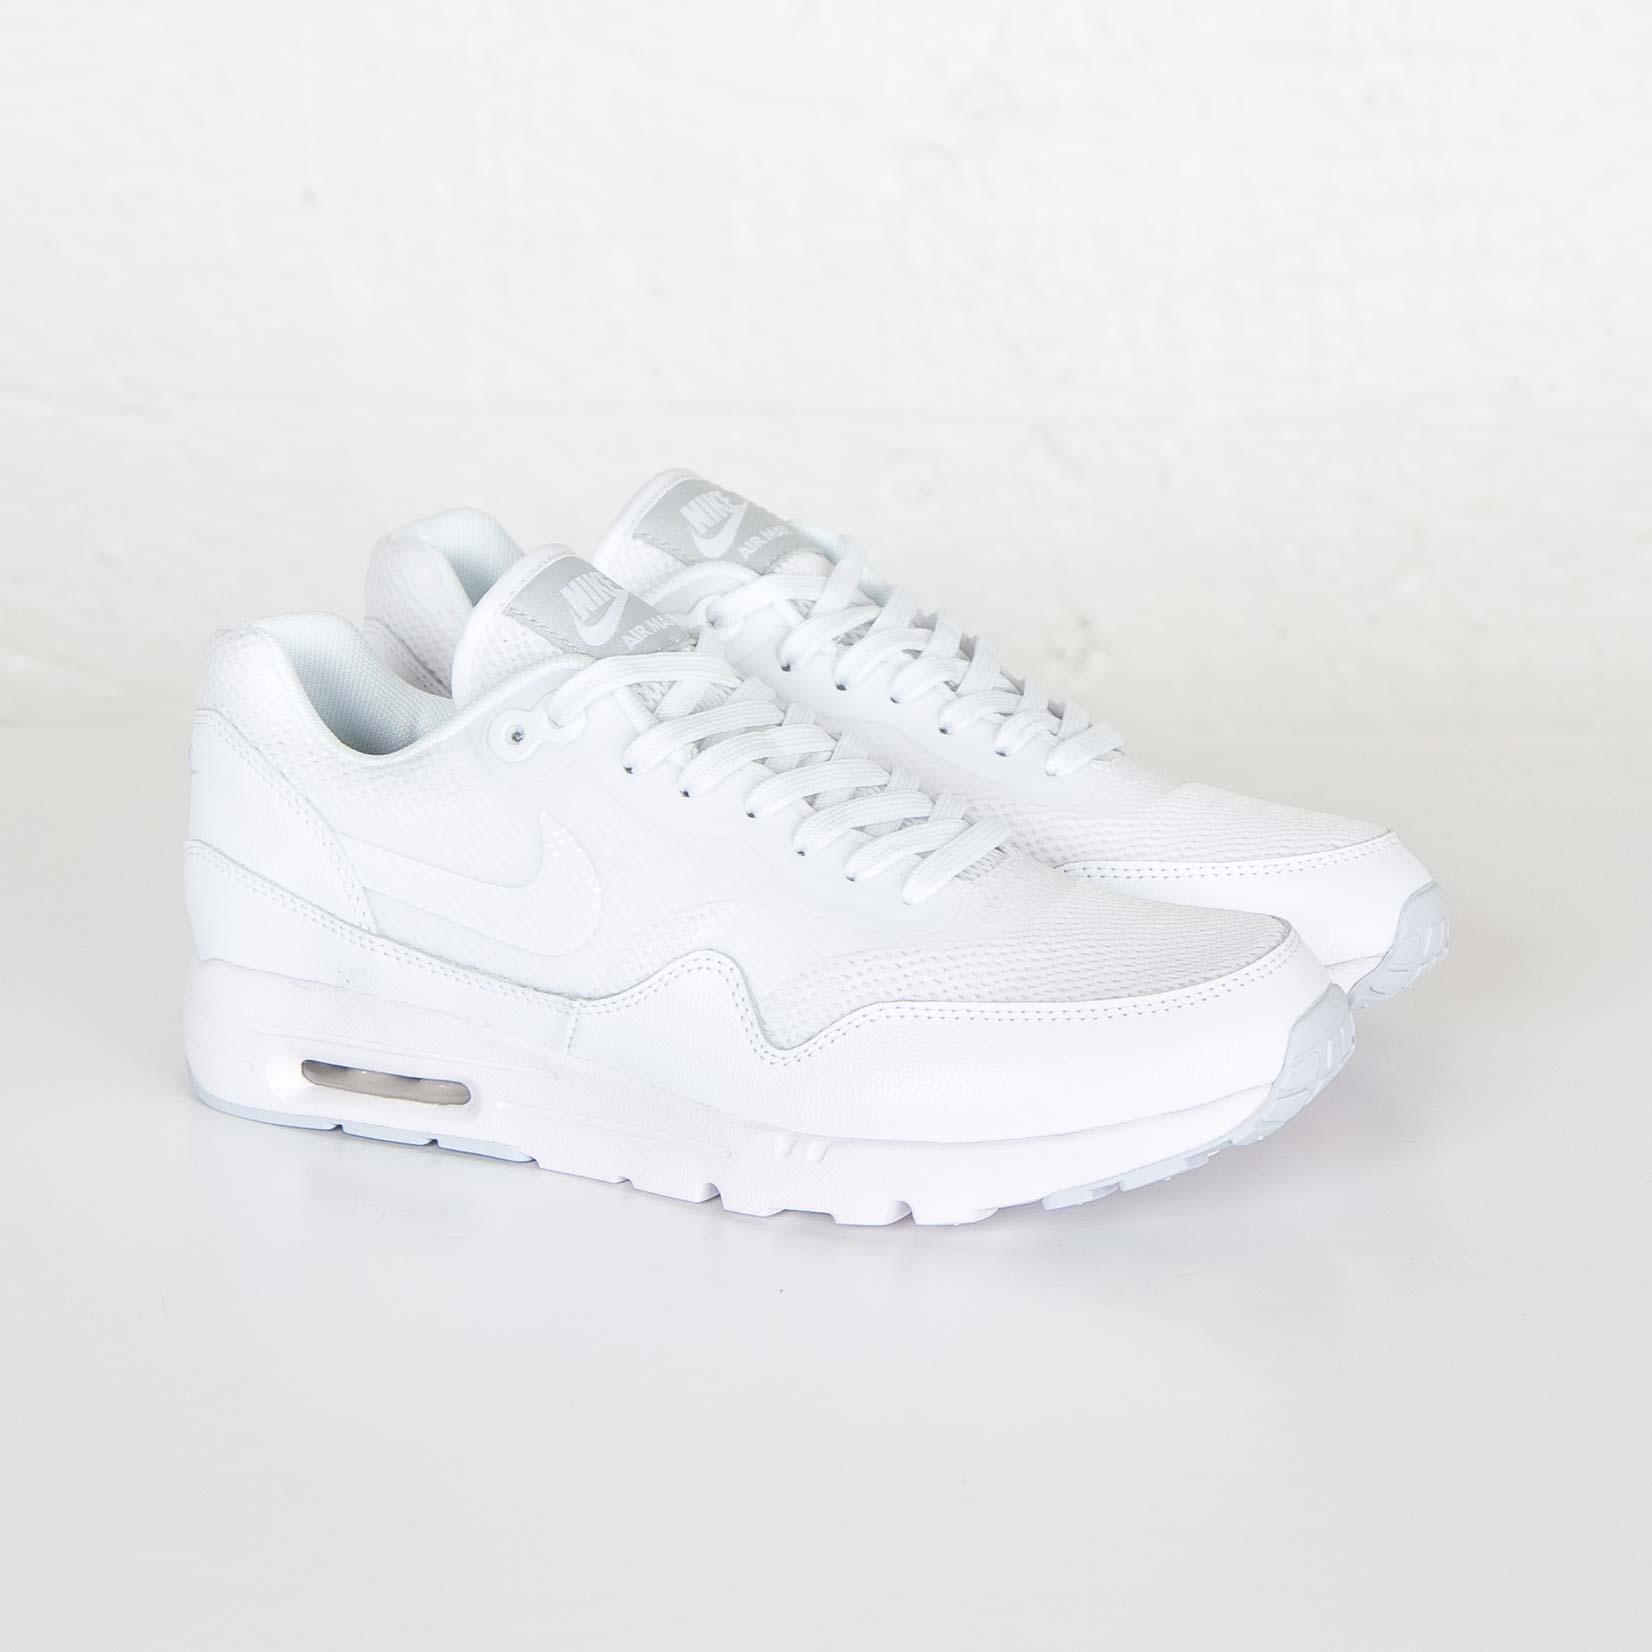 Nike W Air Max 1 Ultra Essential 704993 103